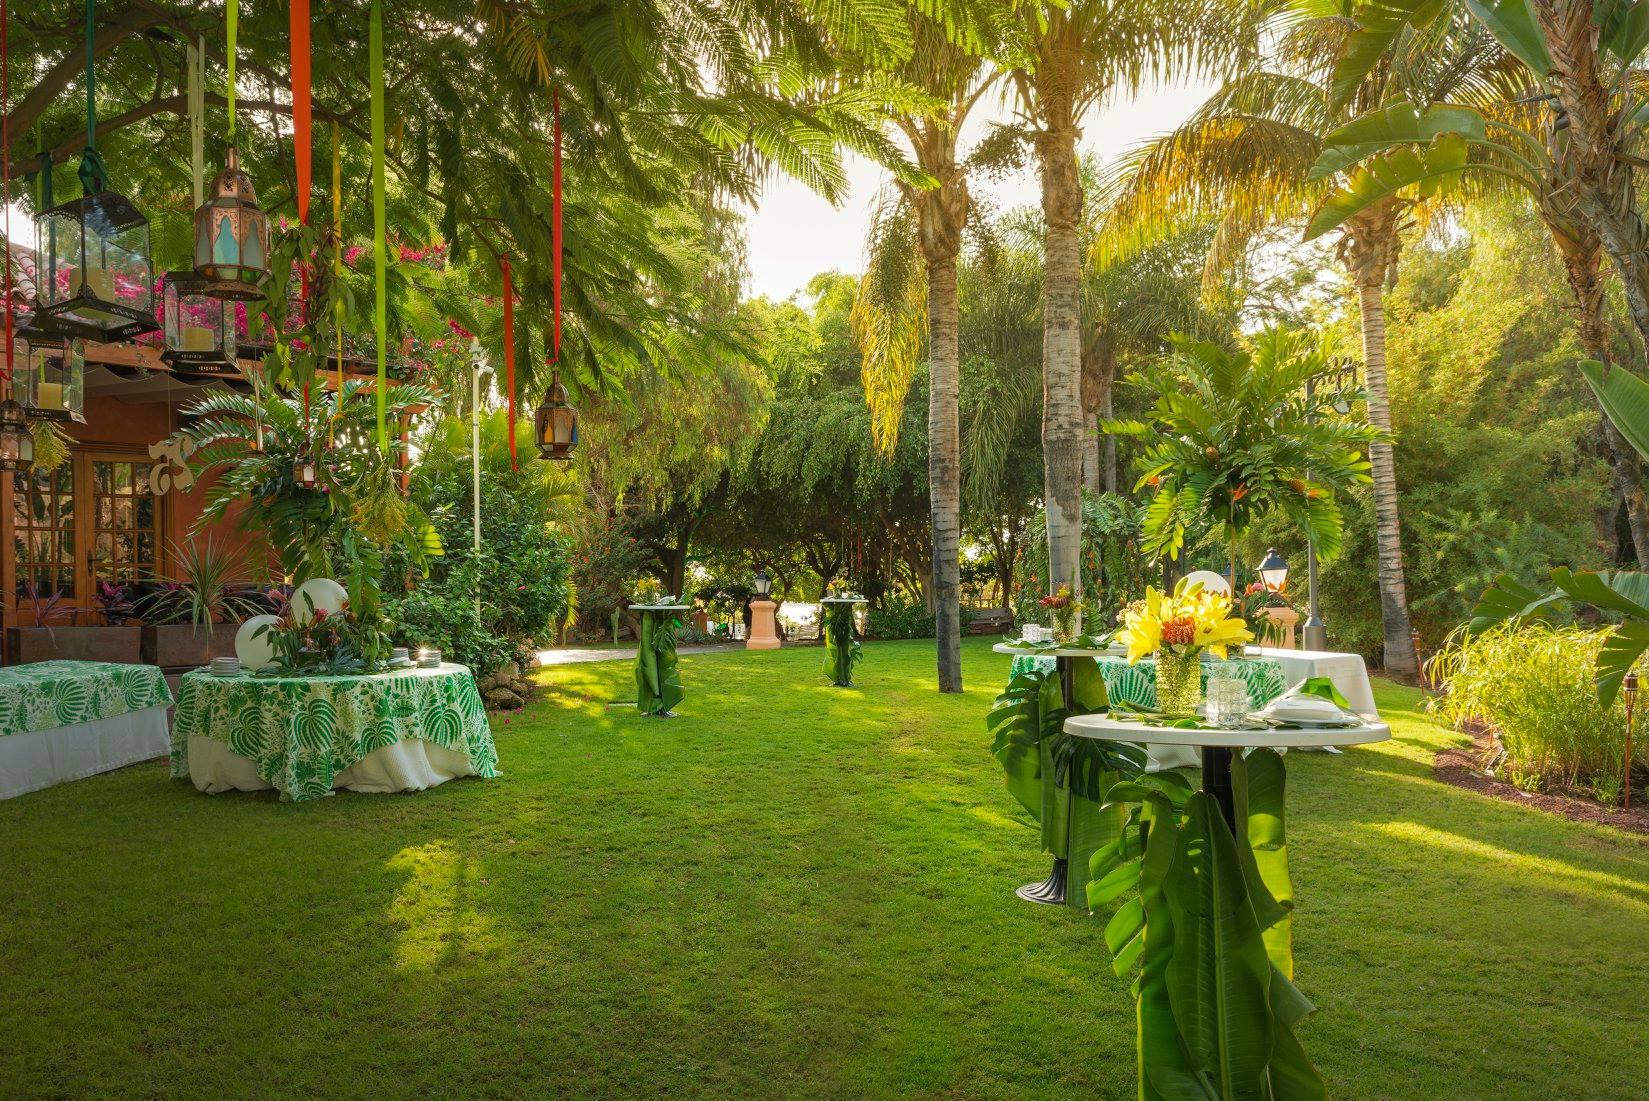 Garden for cocktails